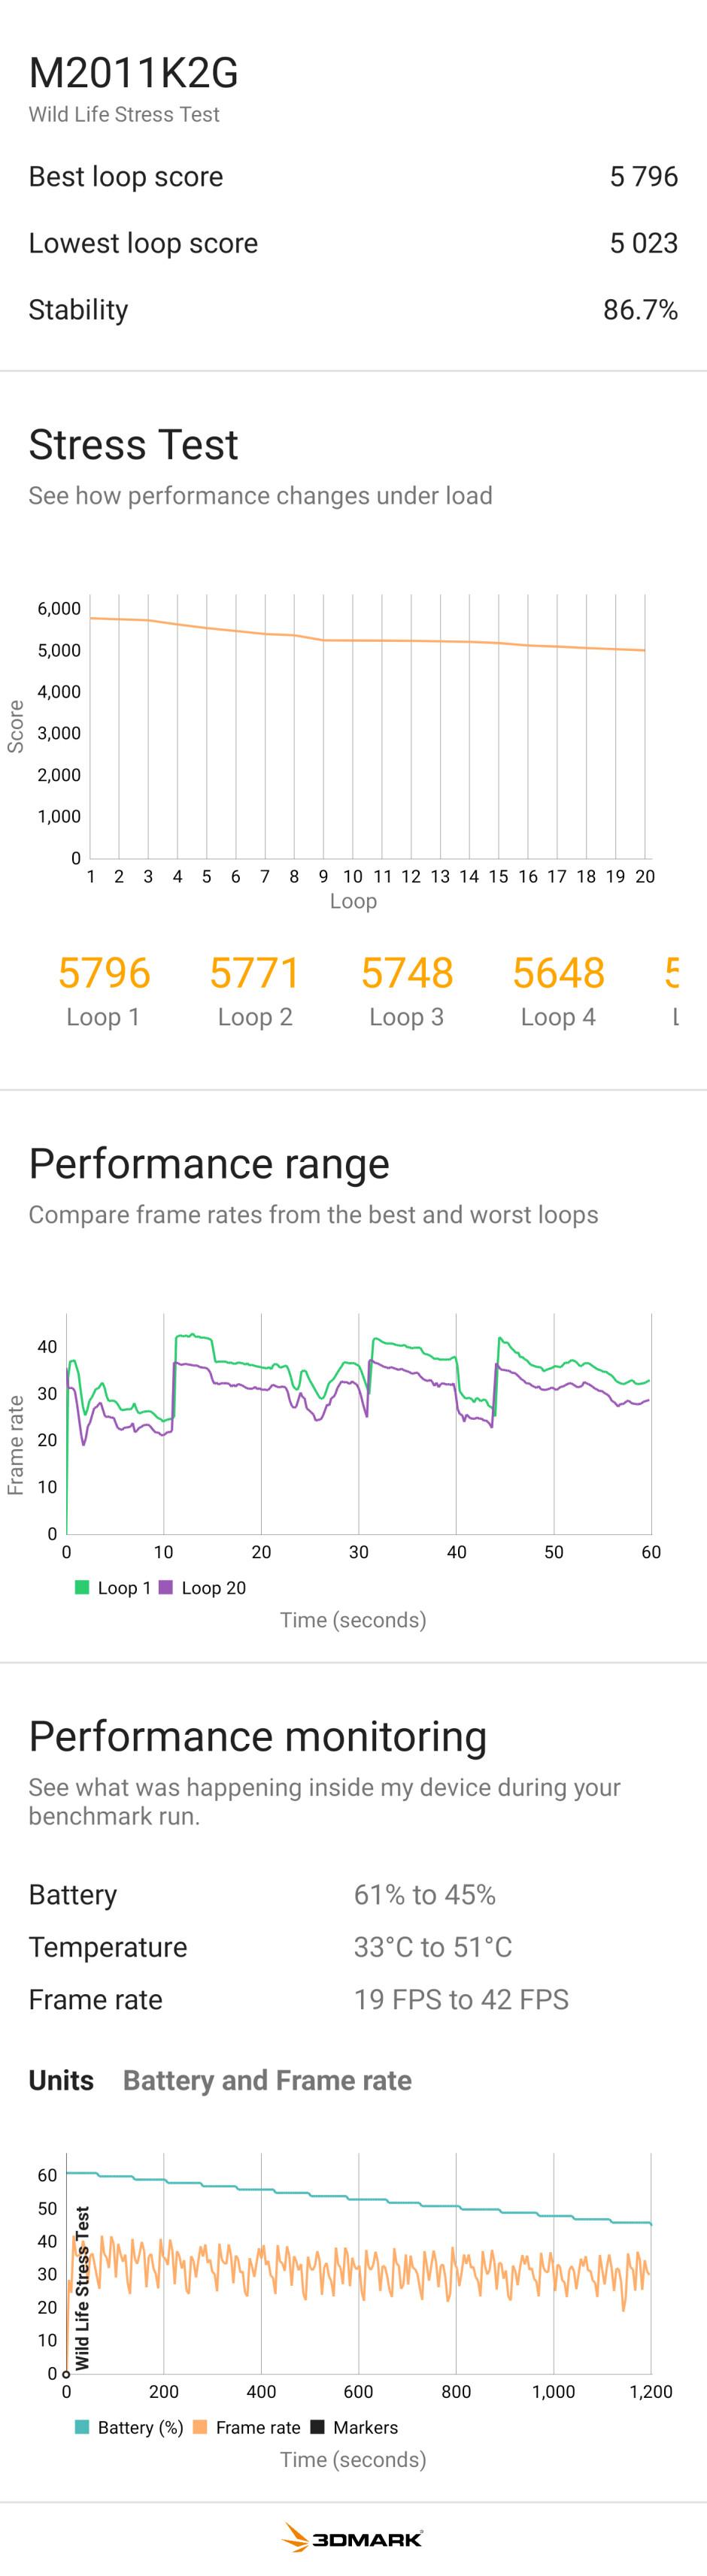 Xiaomi Mi 11 with Snadpragon 888 - PhoneArena Performance Benchmark Test Results